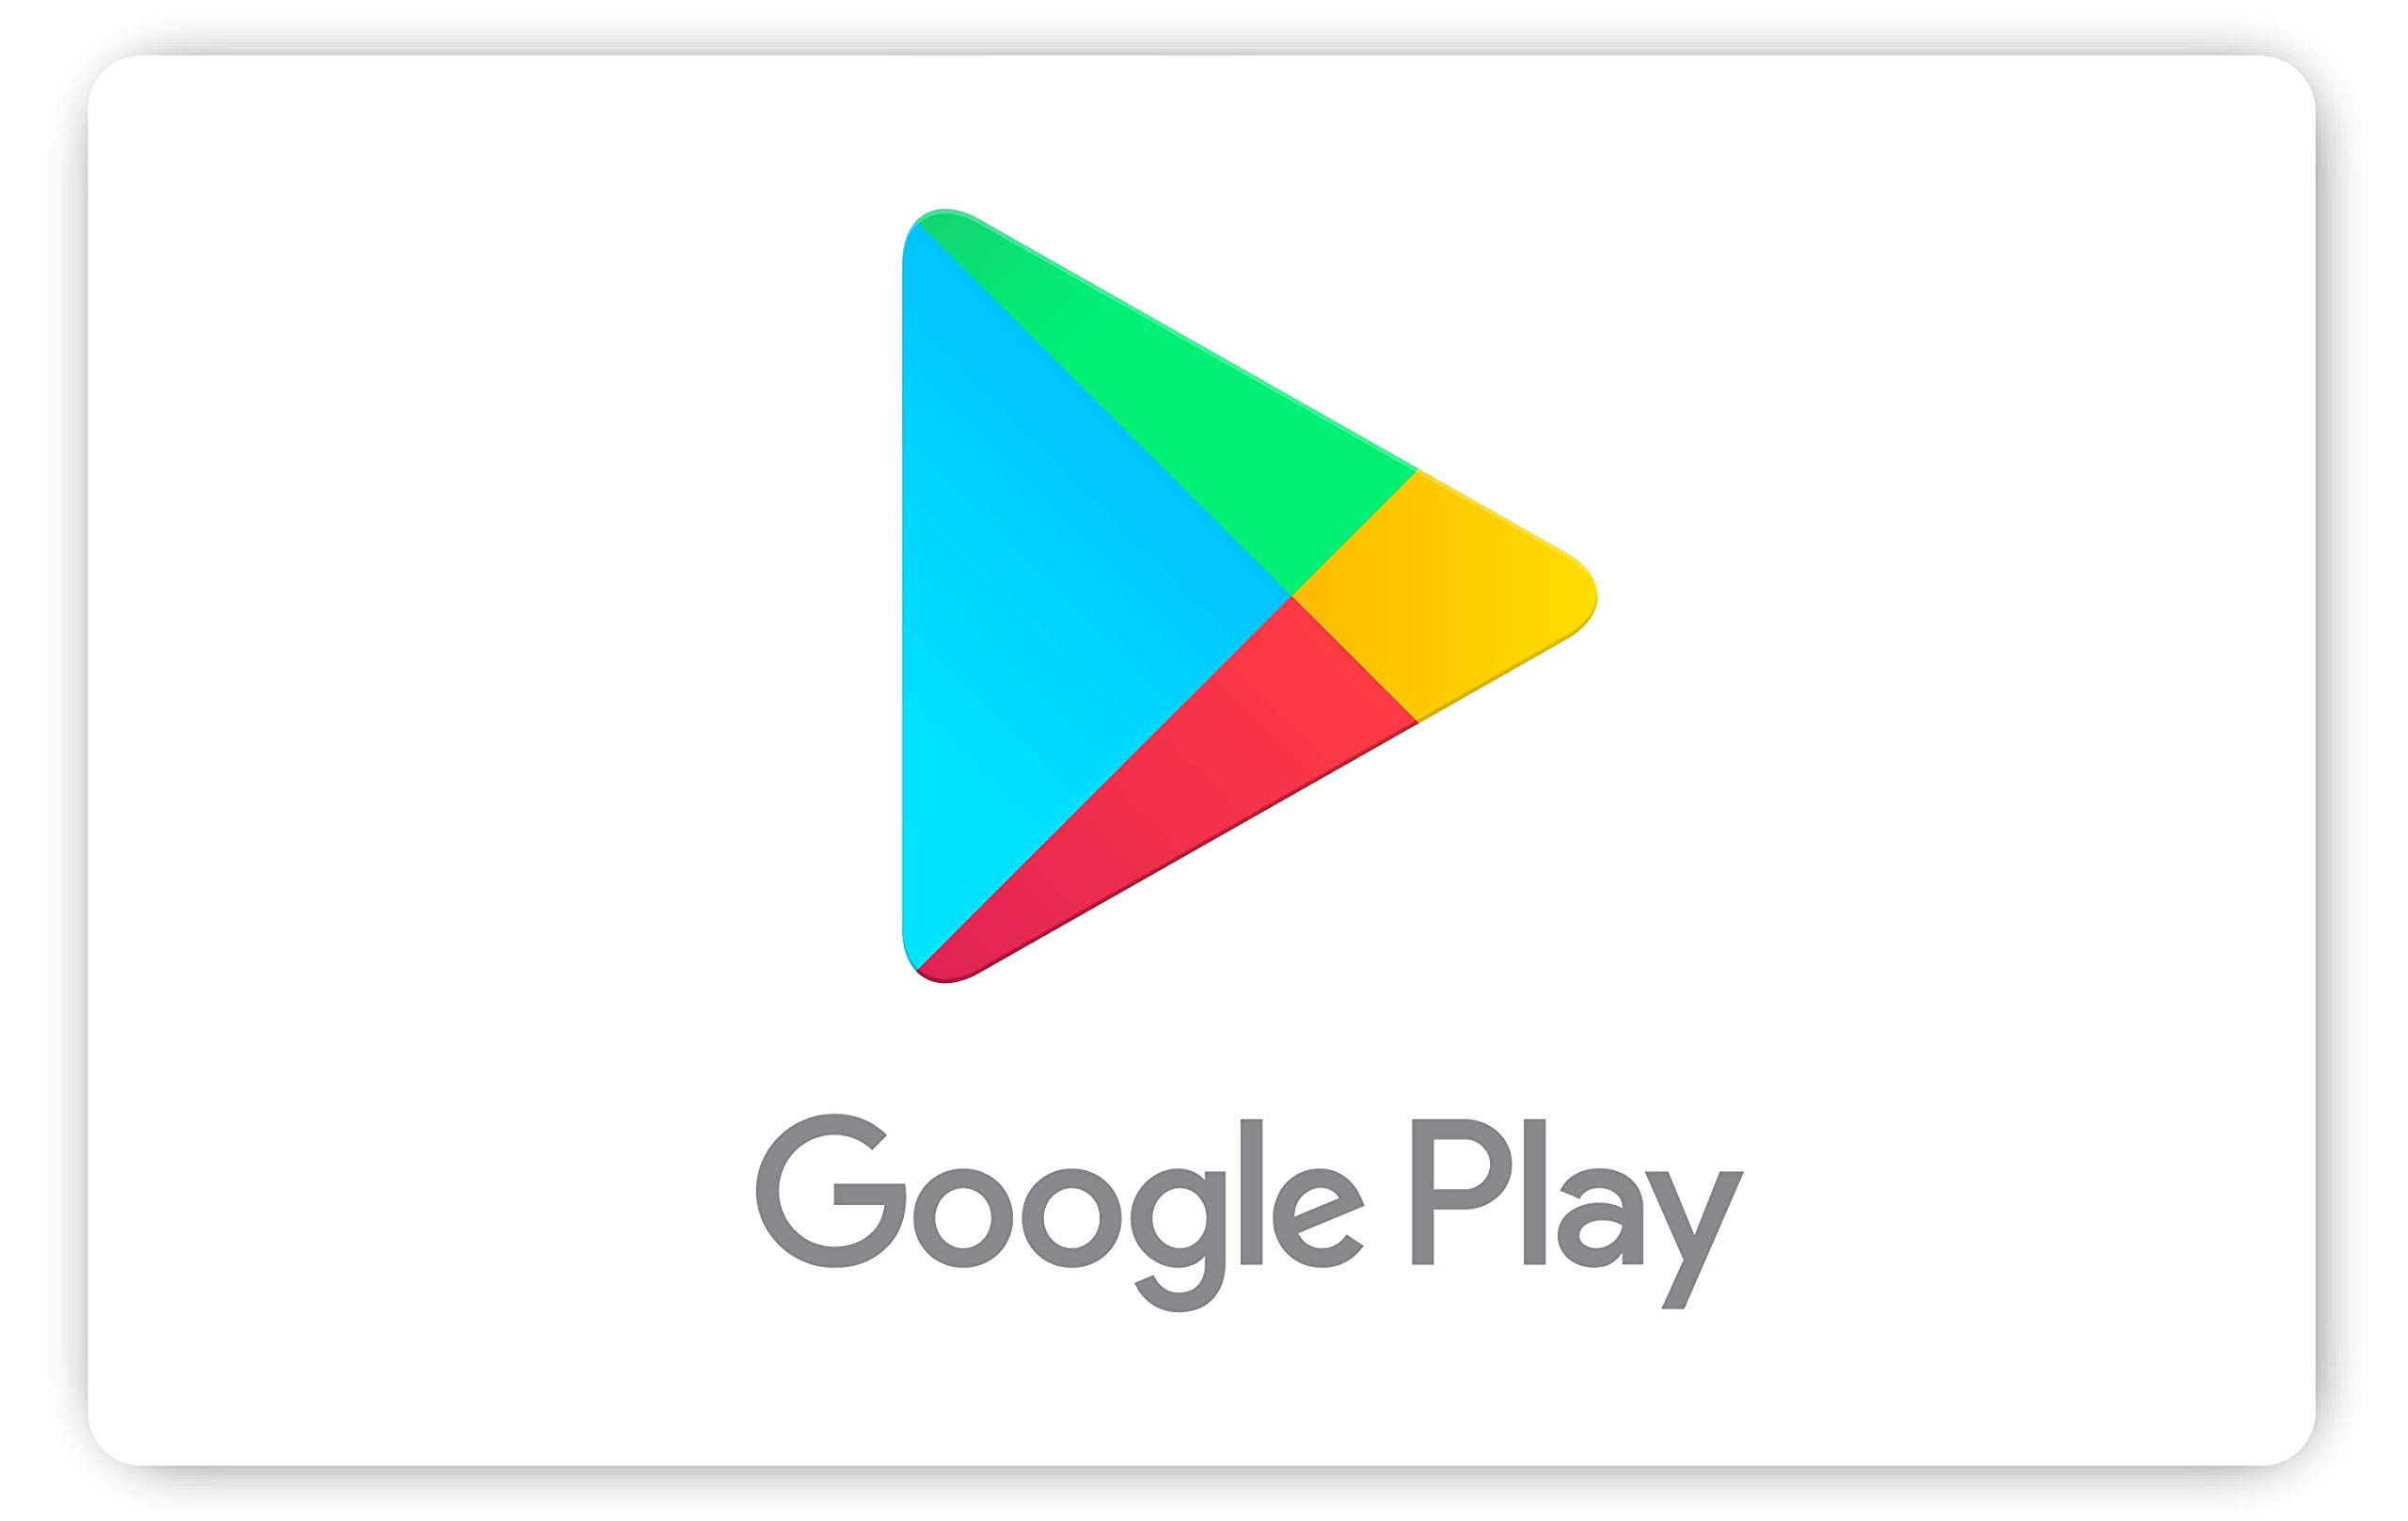 Google Play image link